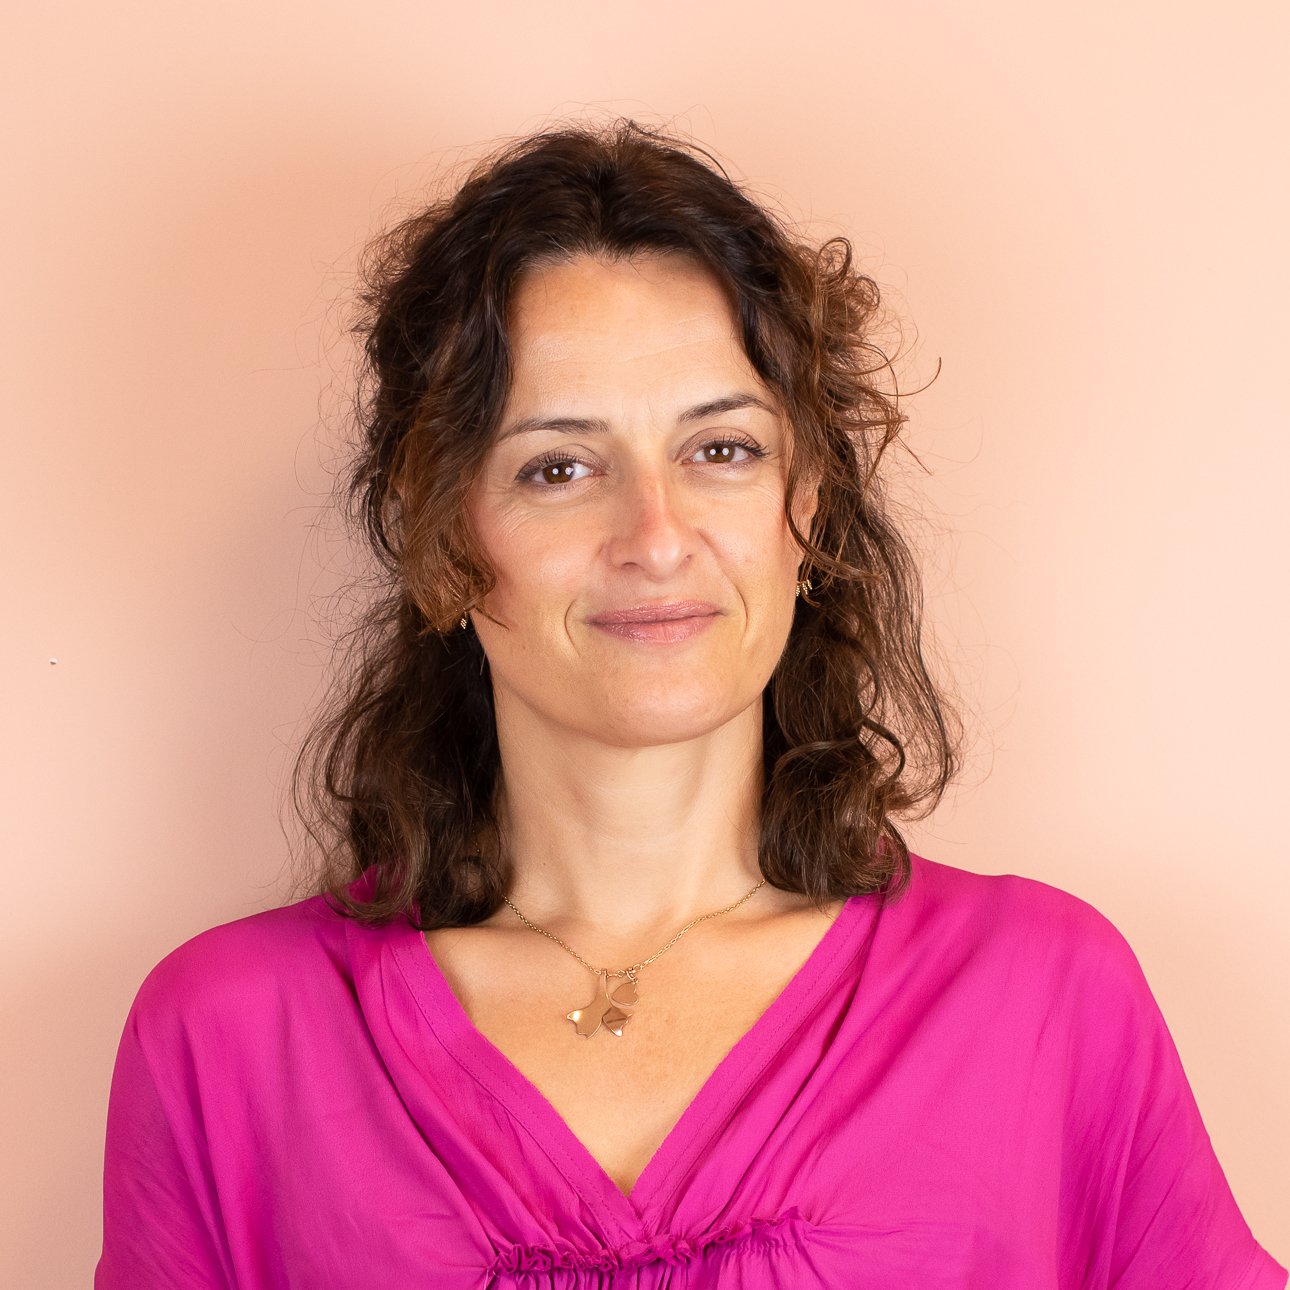 Anna Bianca Prevedini